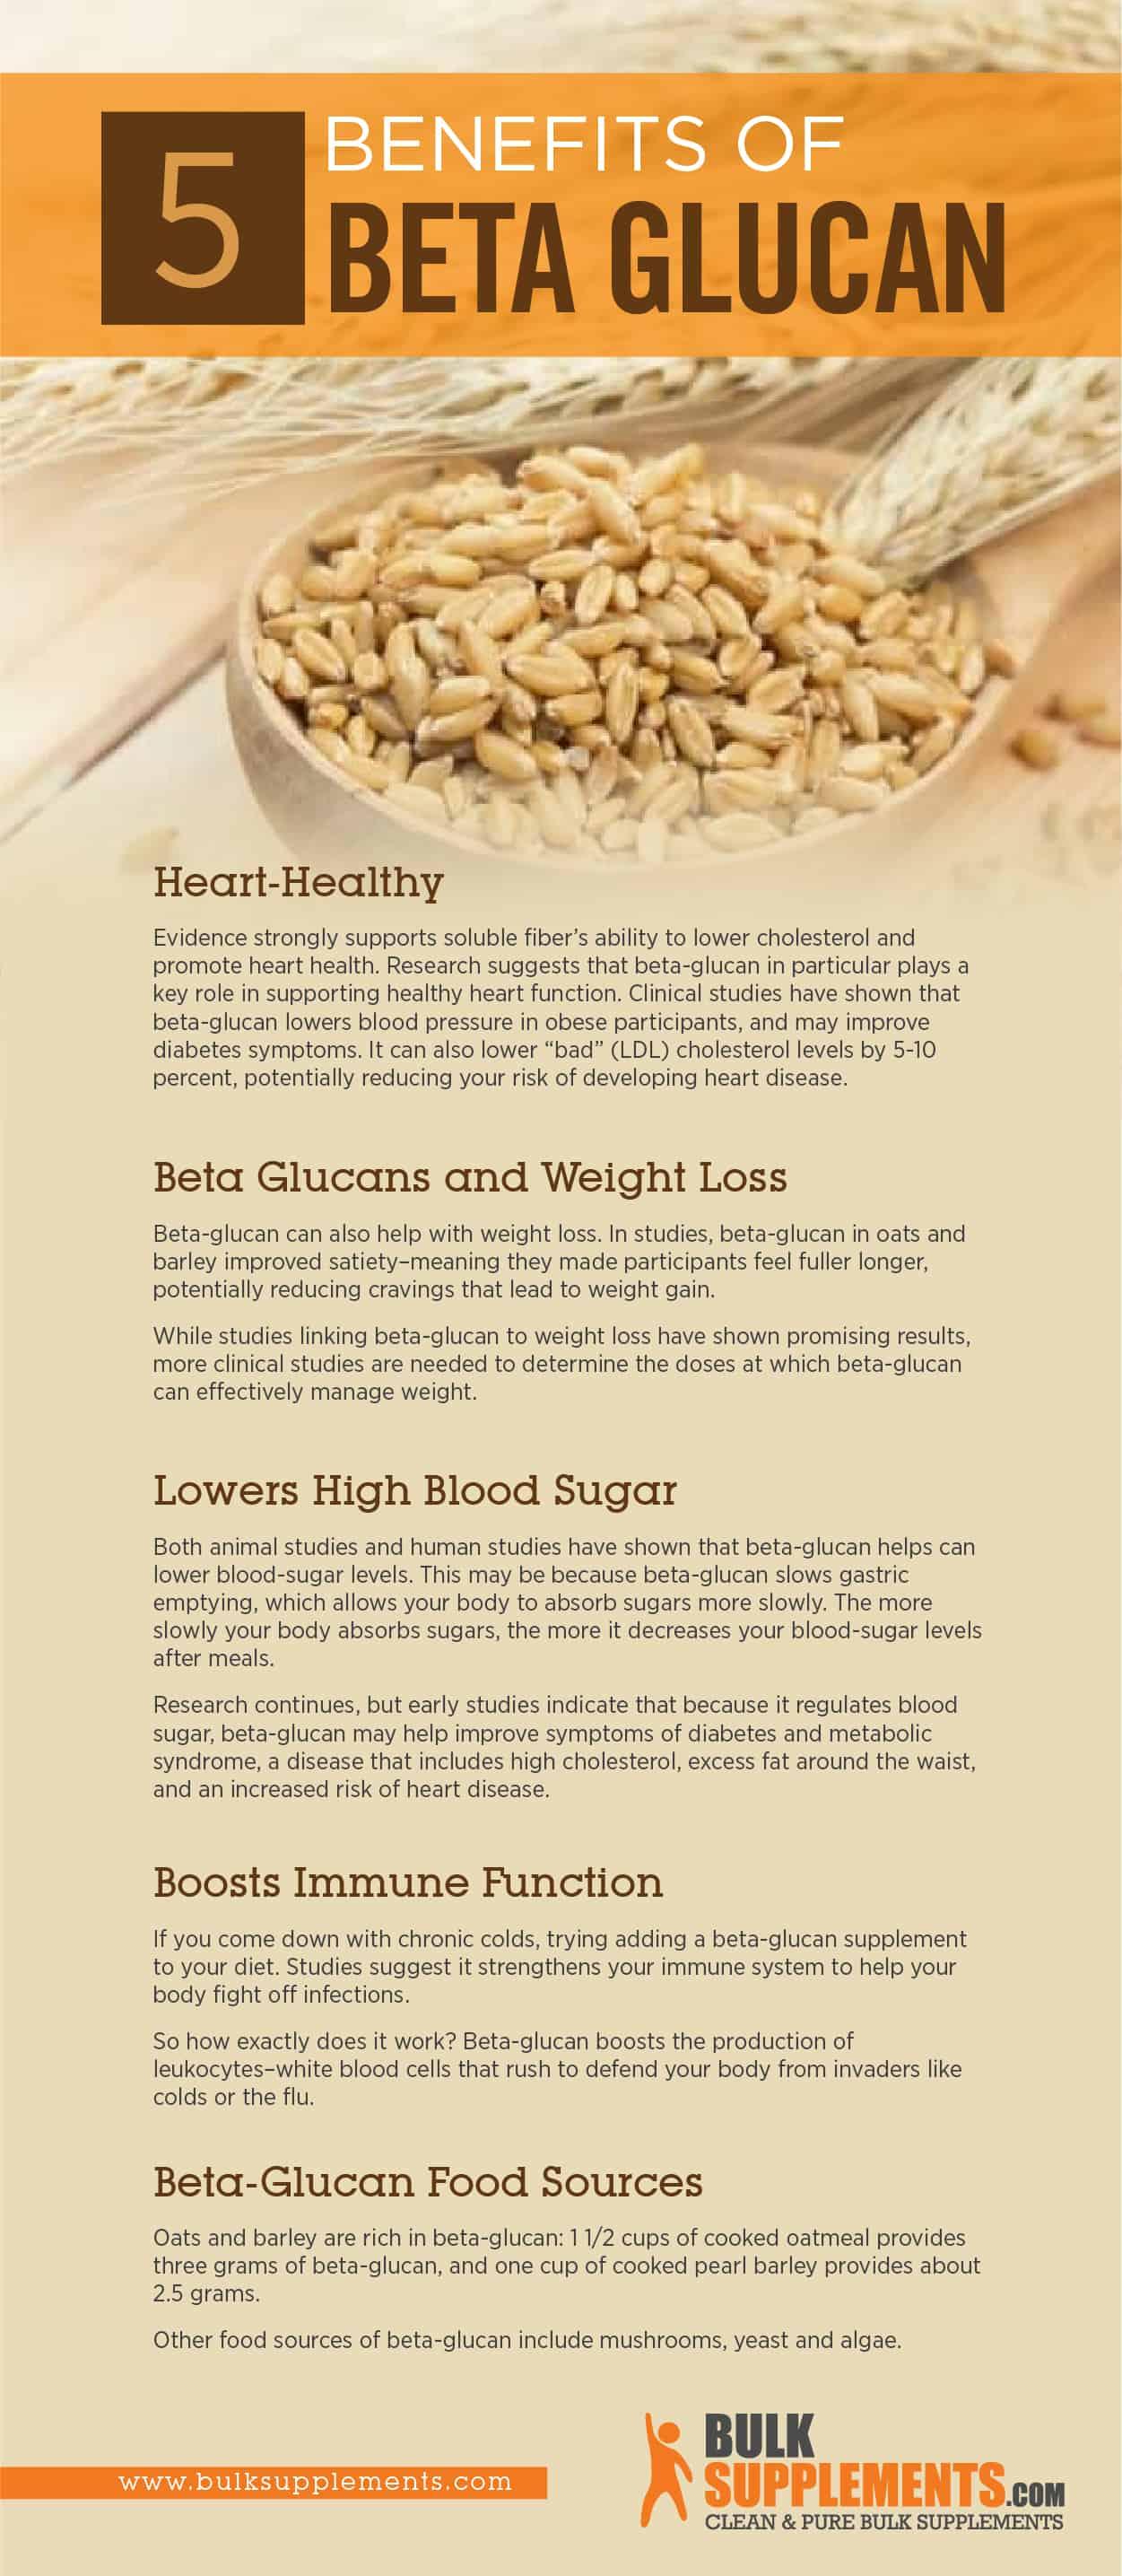 Beta-Glucan Benefits